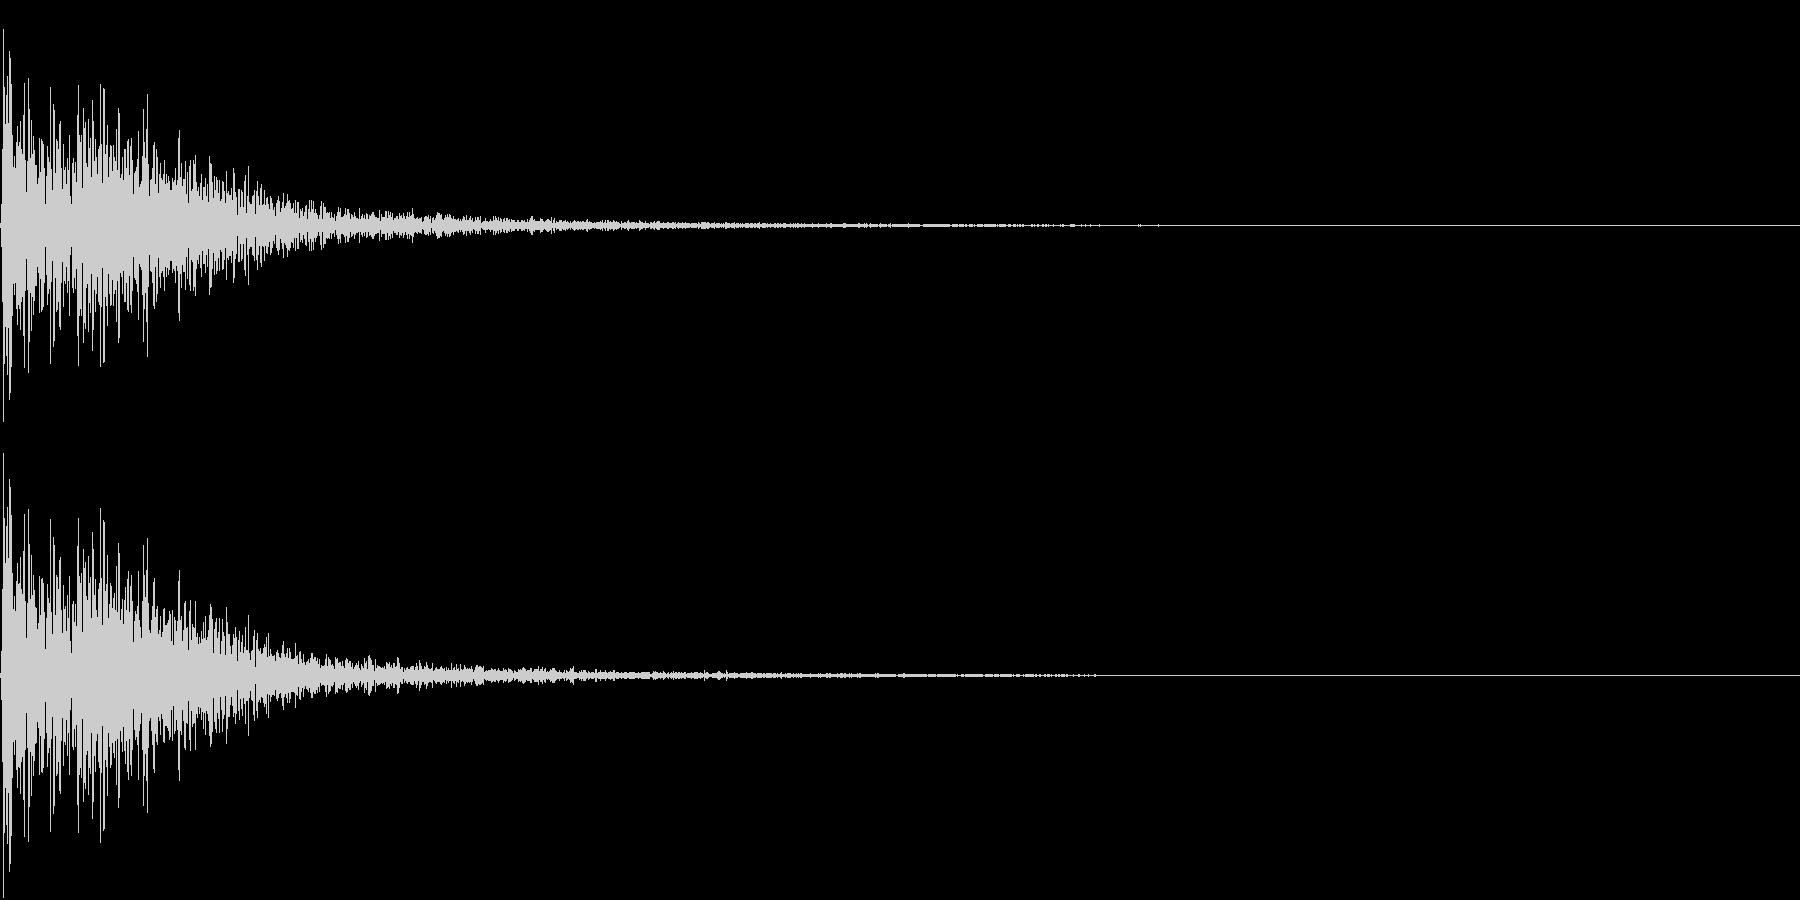 FinalJudge 裁判 判決 木槌音の未再生の波形